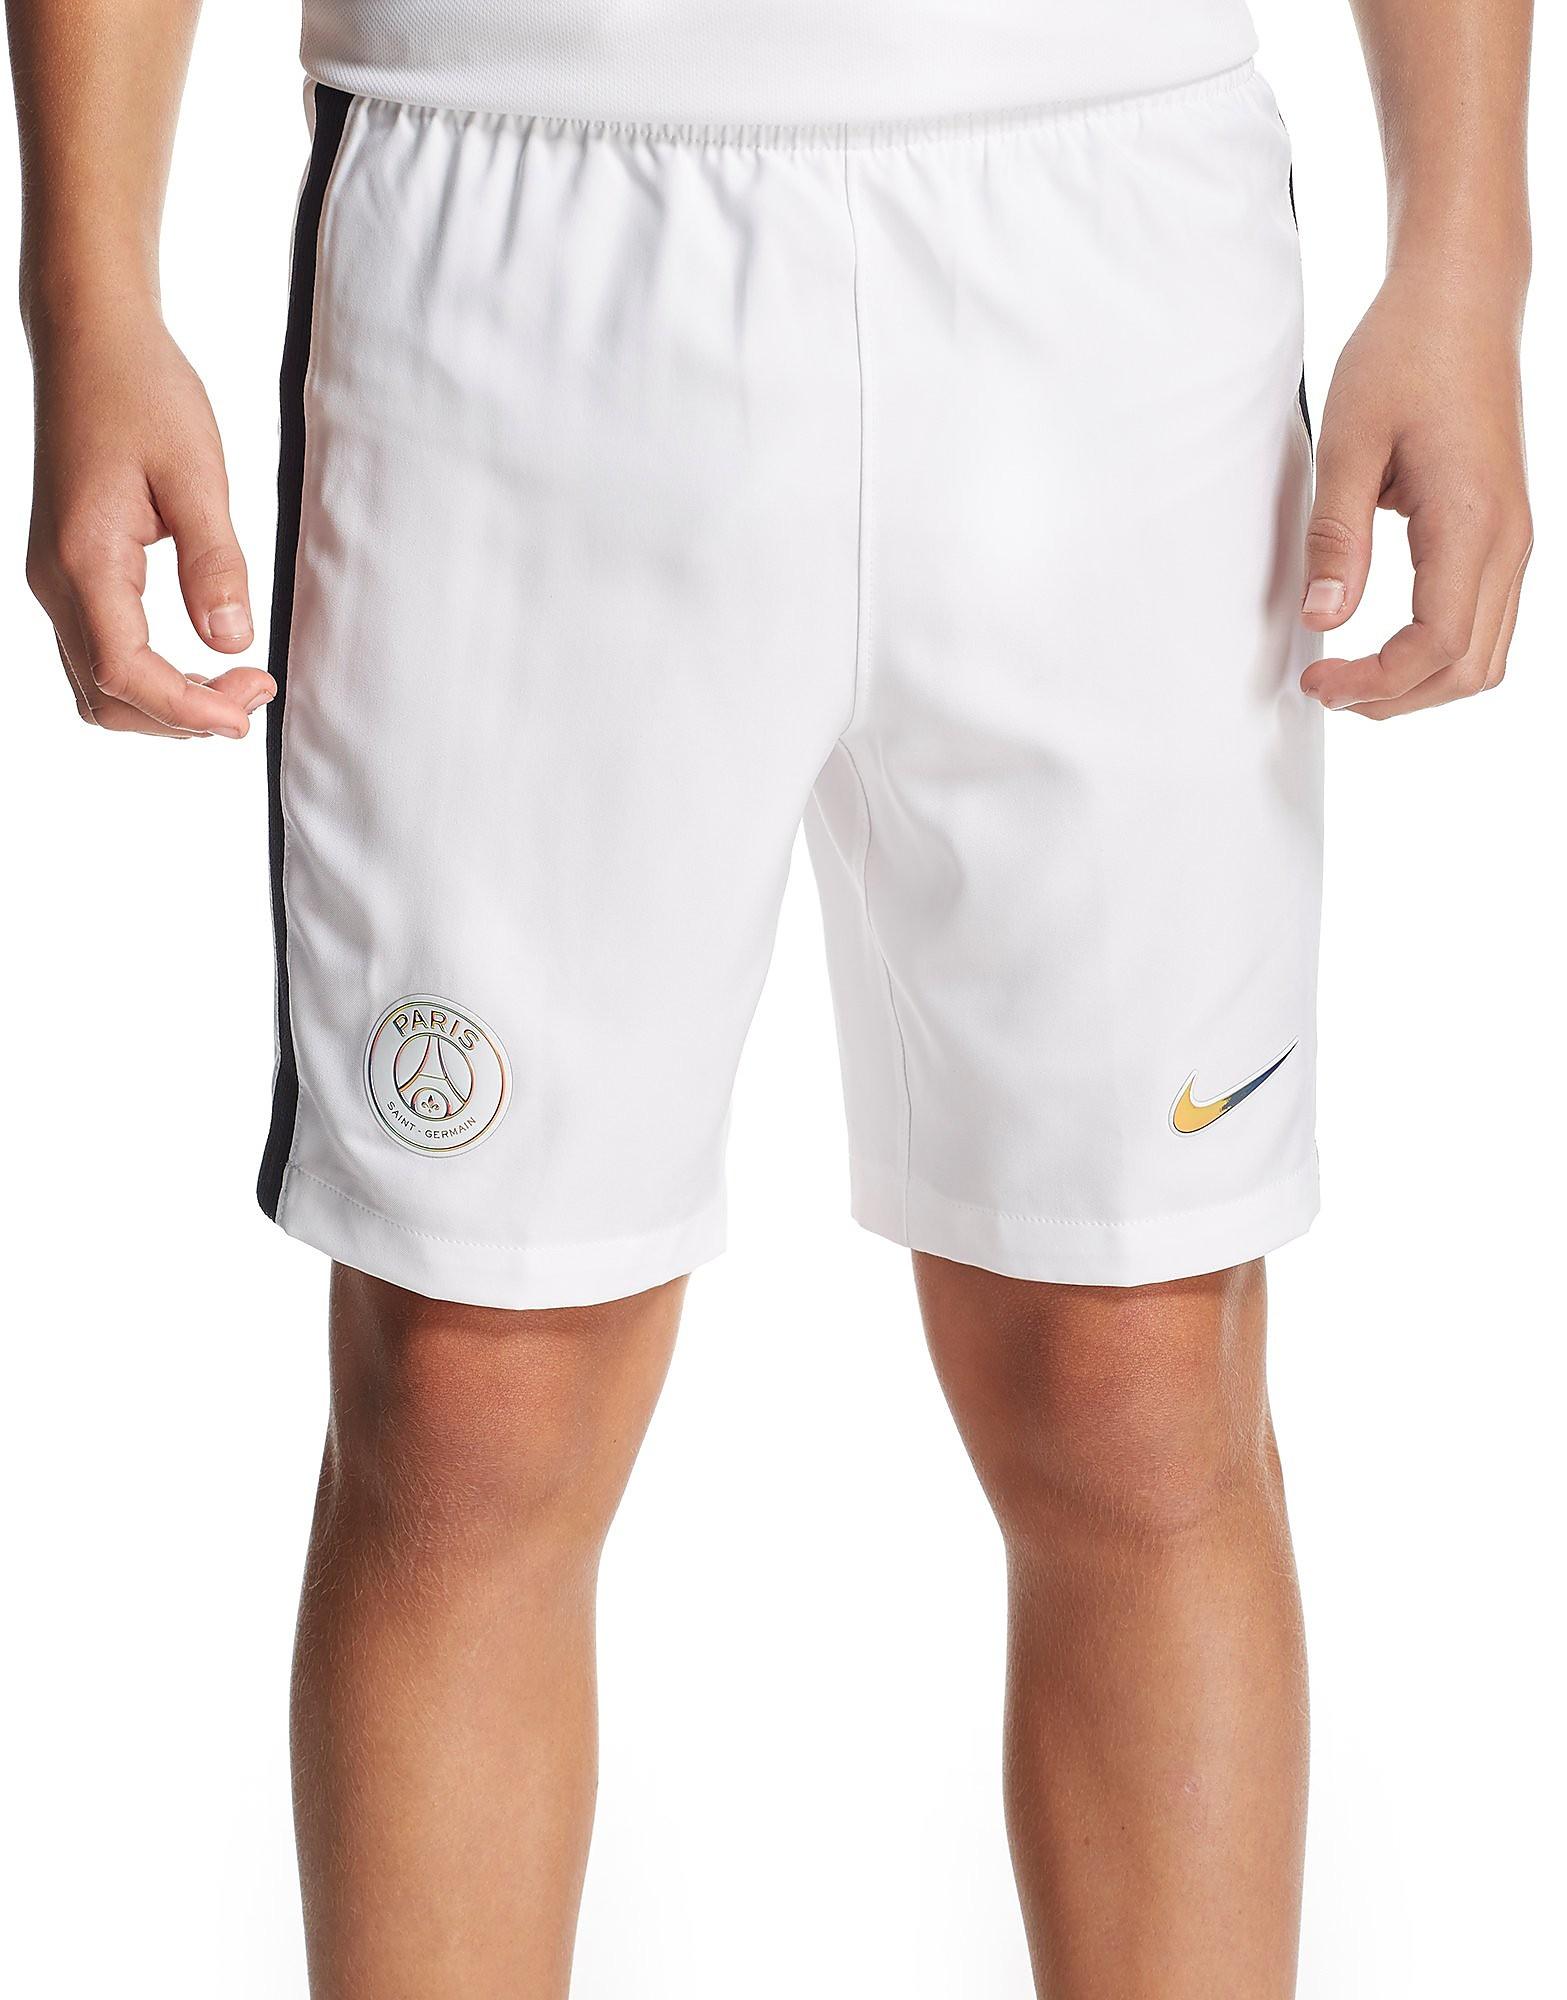 Nike Short da trasferta Paris Saint Germain 2016/17 bambino